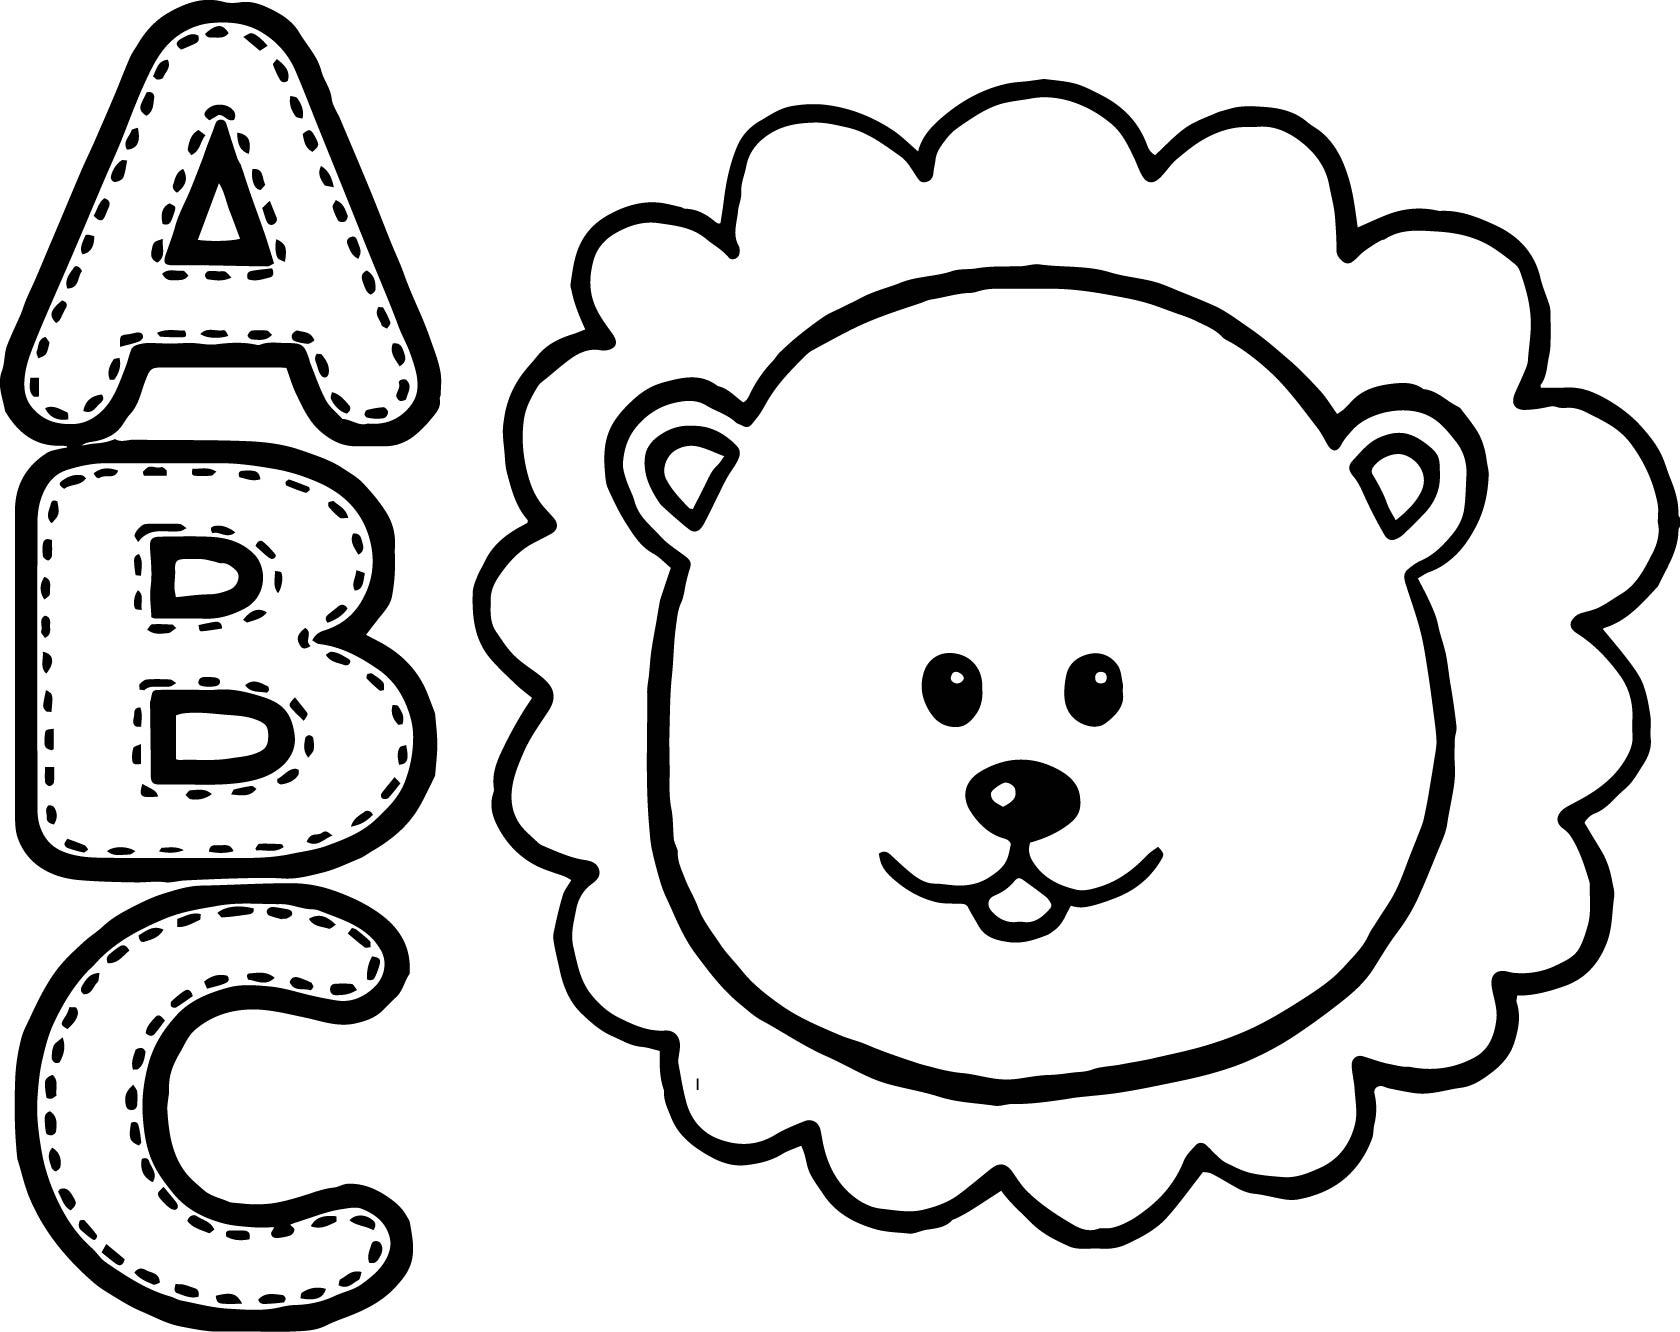 lion coloring pages free download best lion coloring pages on. Black Bedroom Furniture Sets. Home Design Ideas